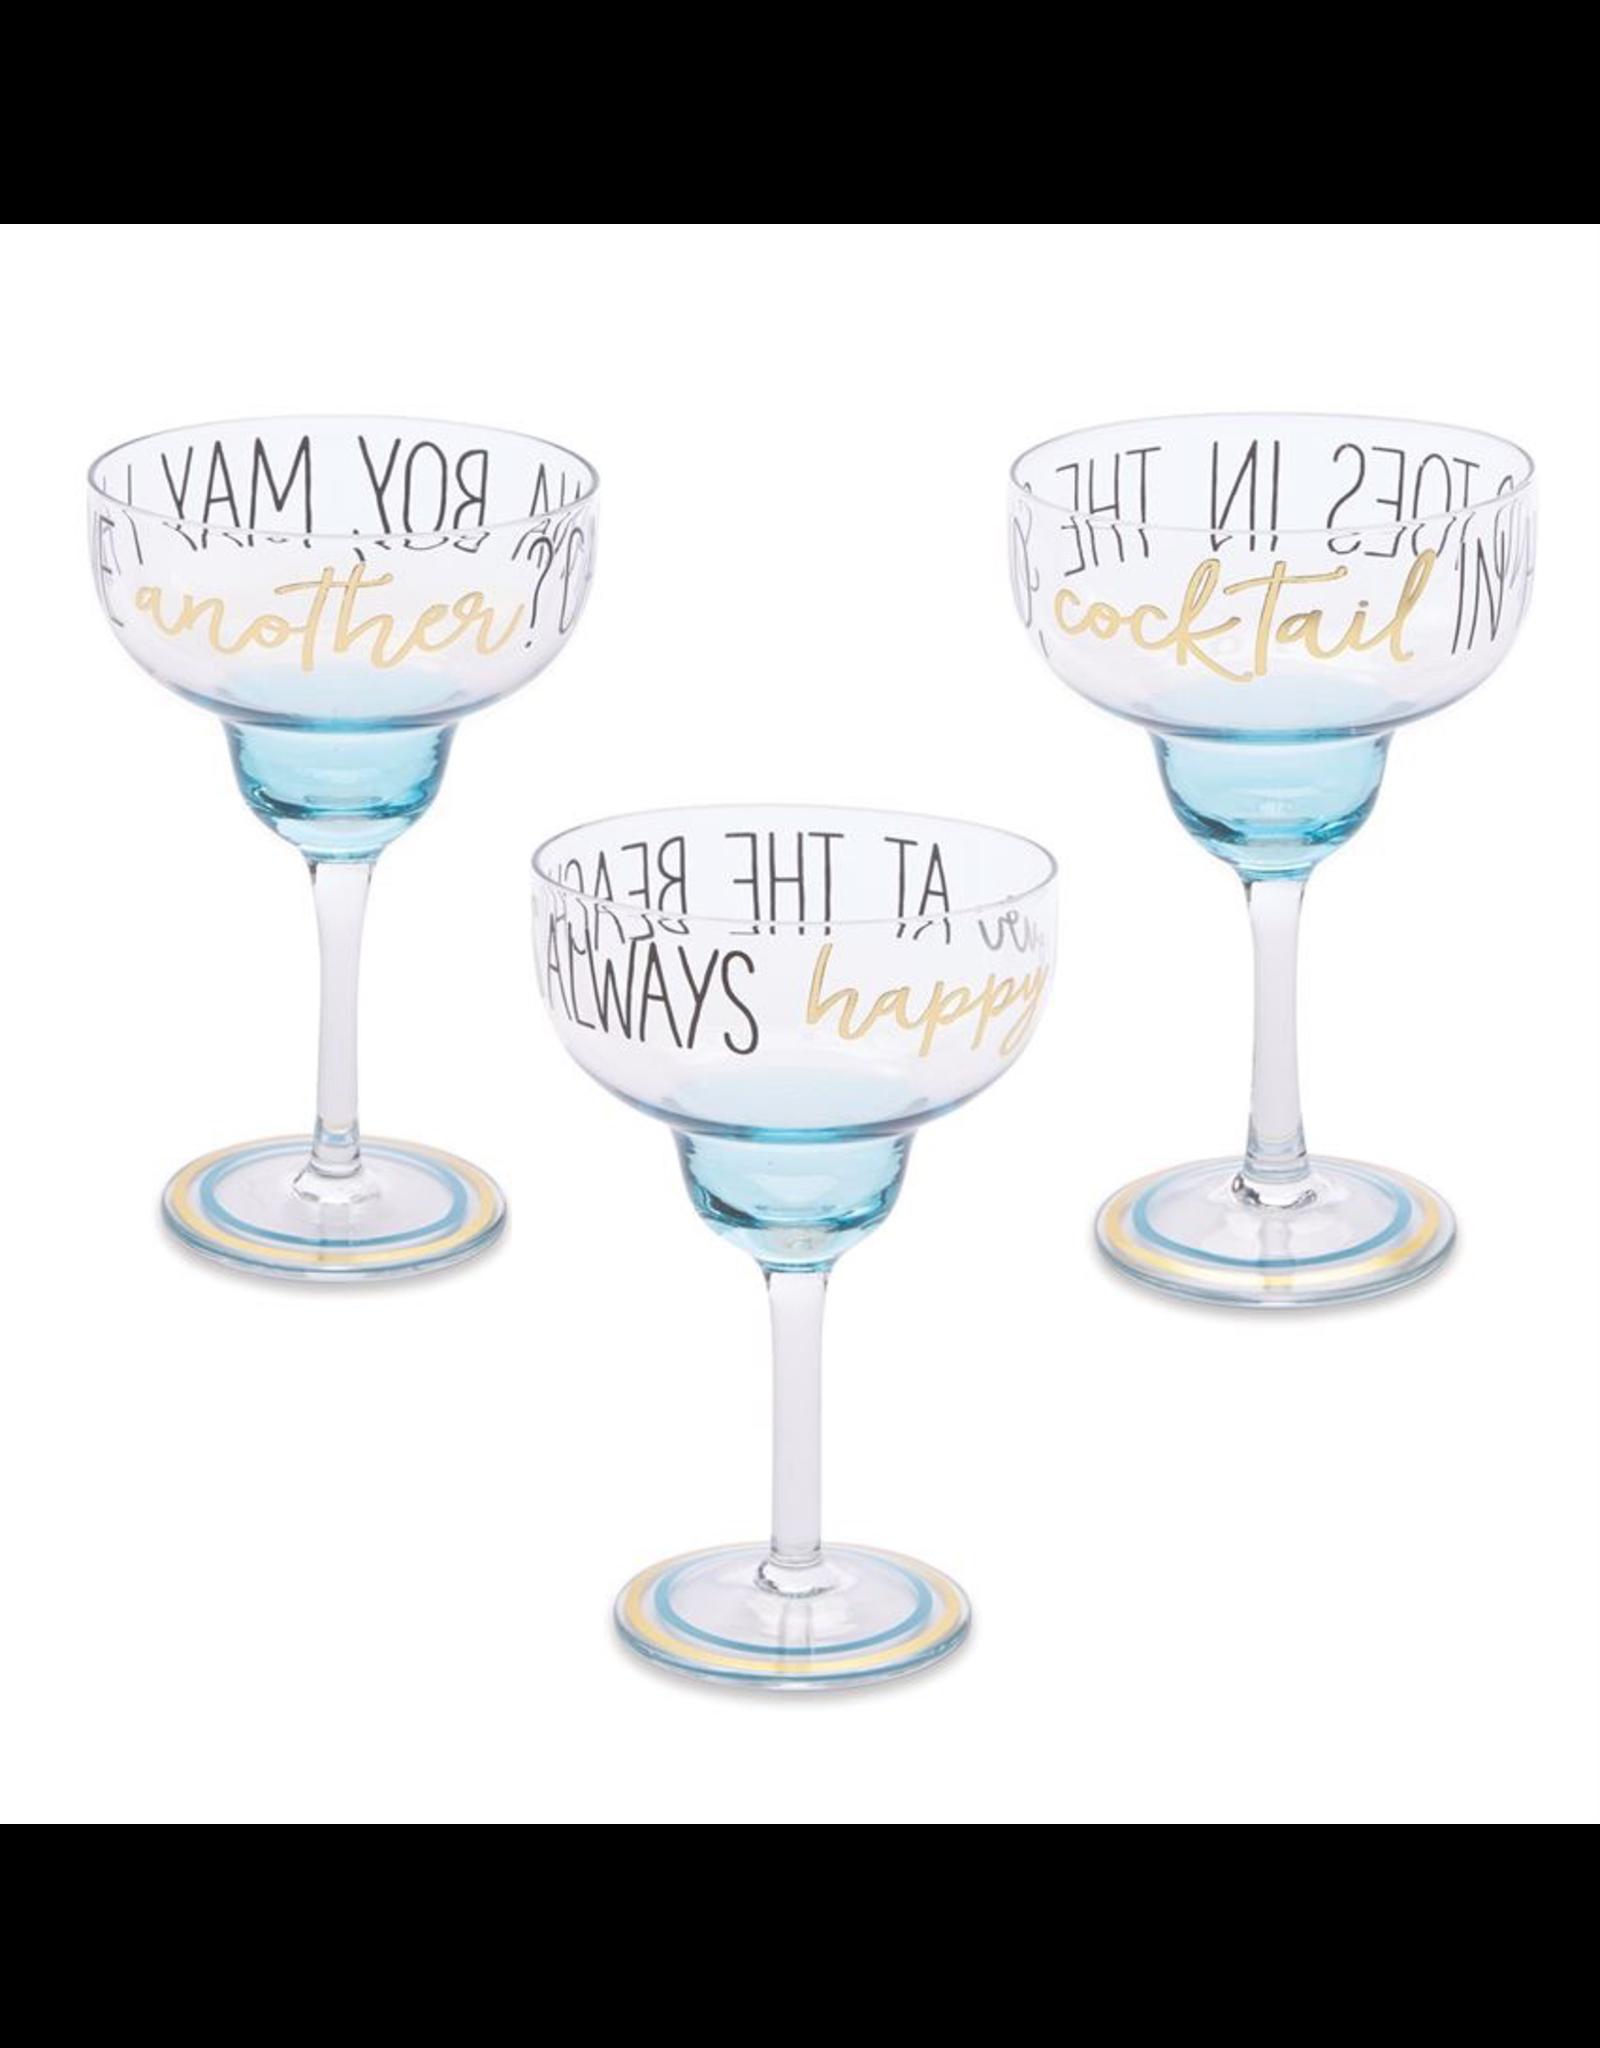 Mudpie Beach Margarita Glasses - Always Happy